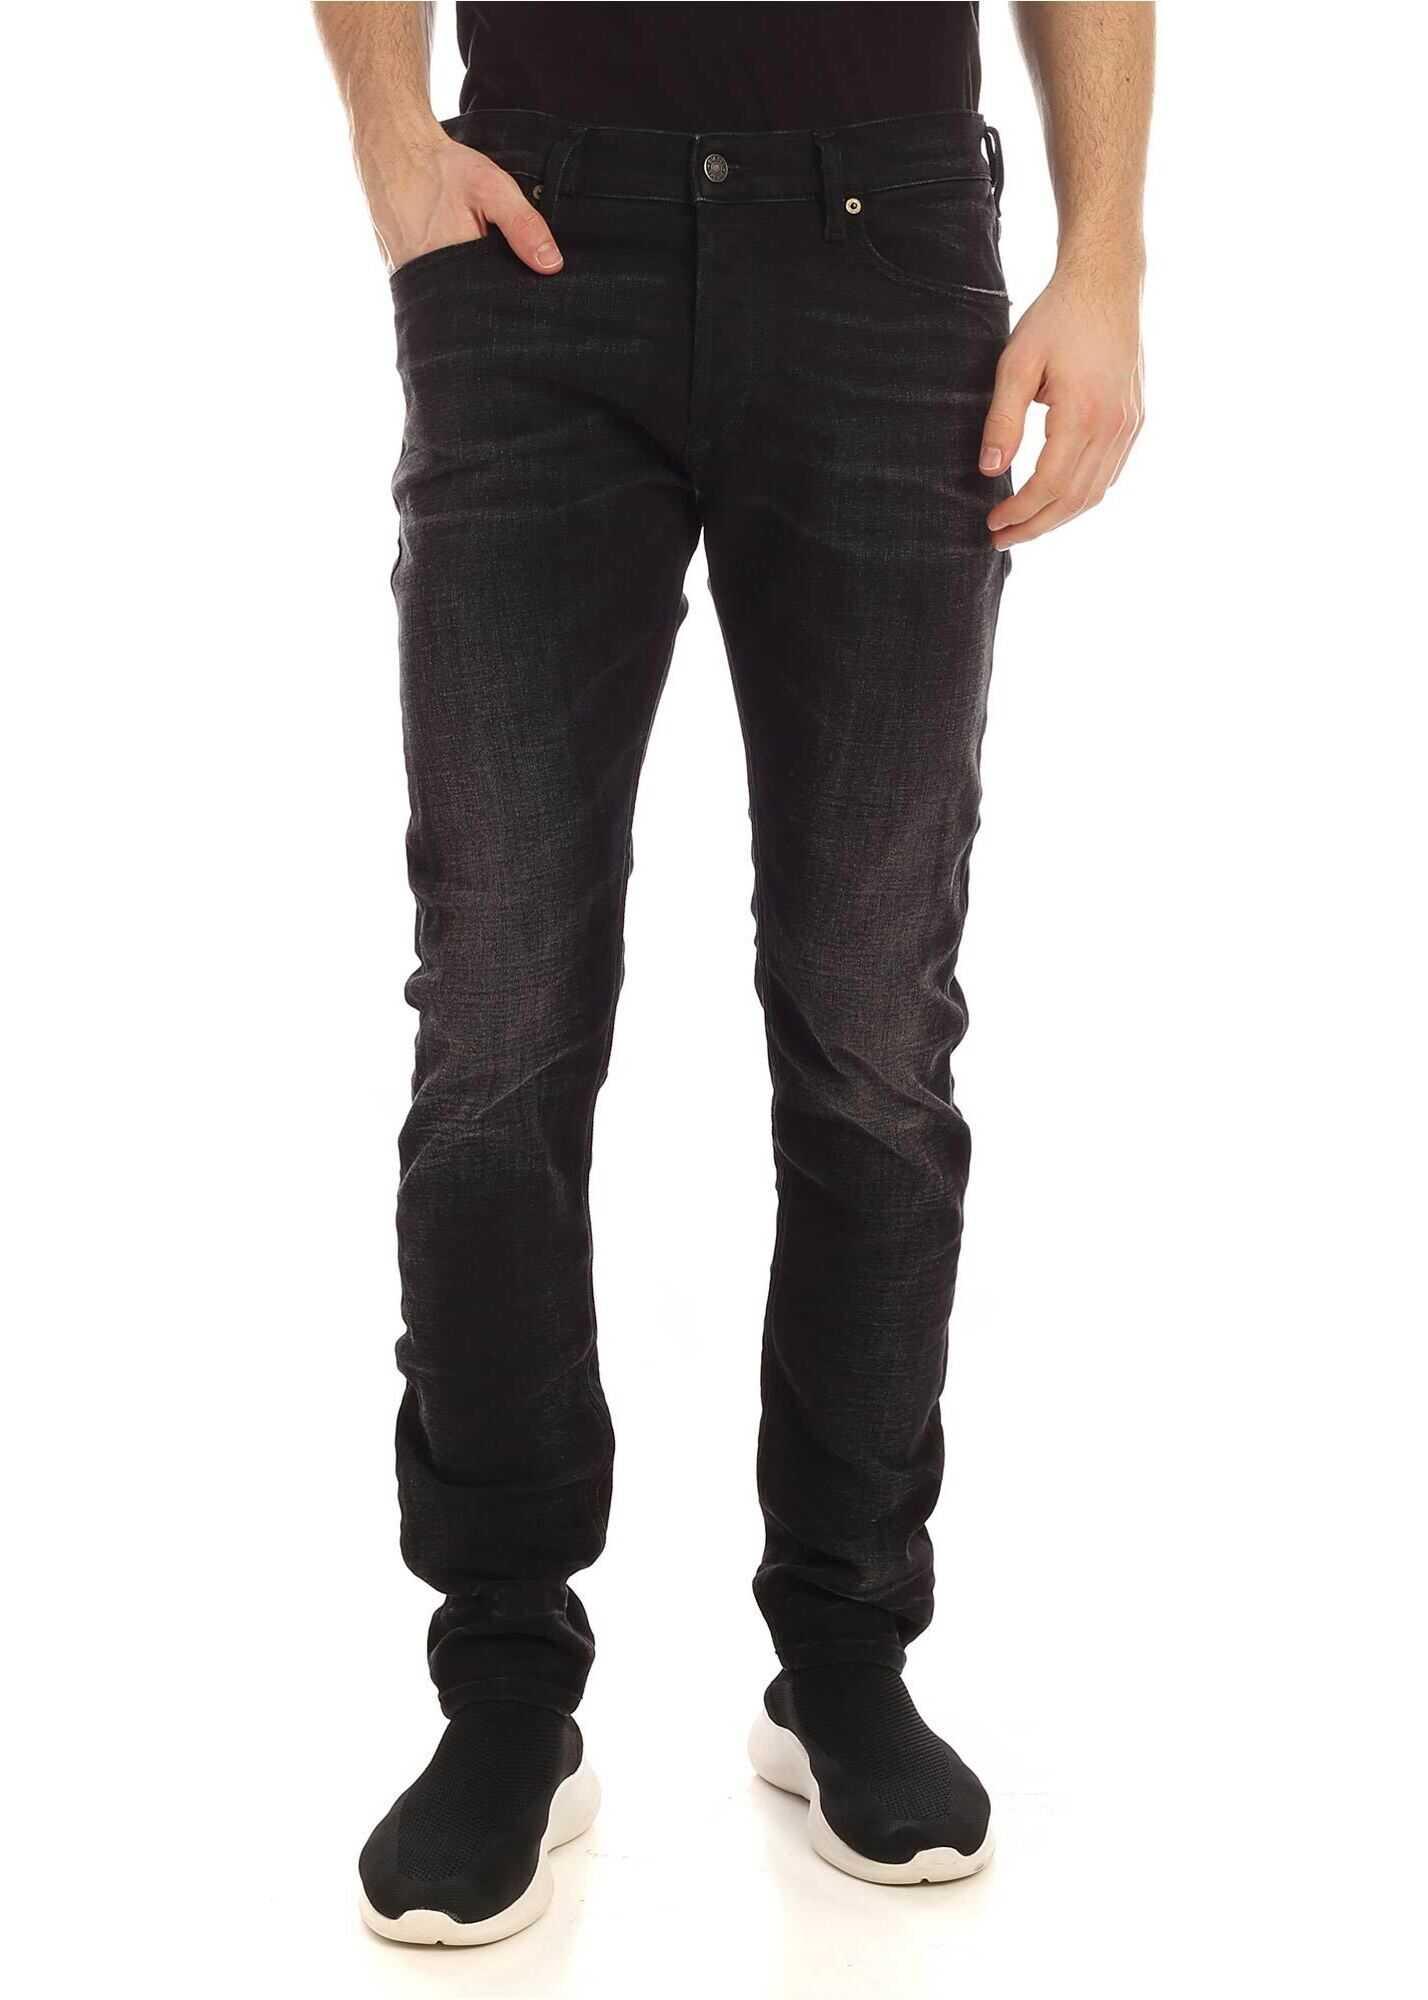 Tepphar-X Jeans In Black thumbnail